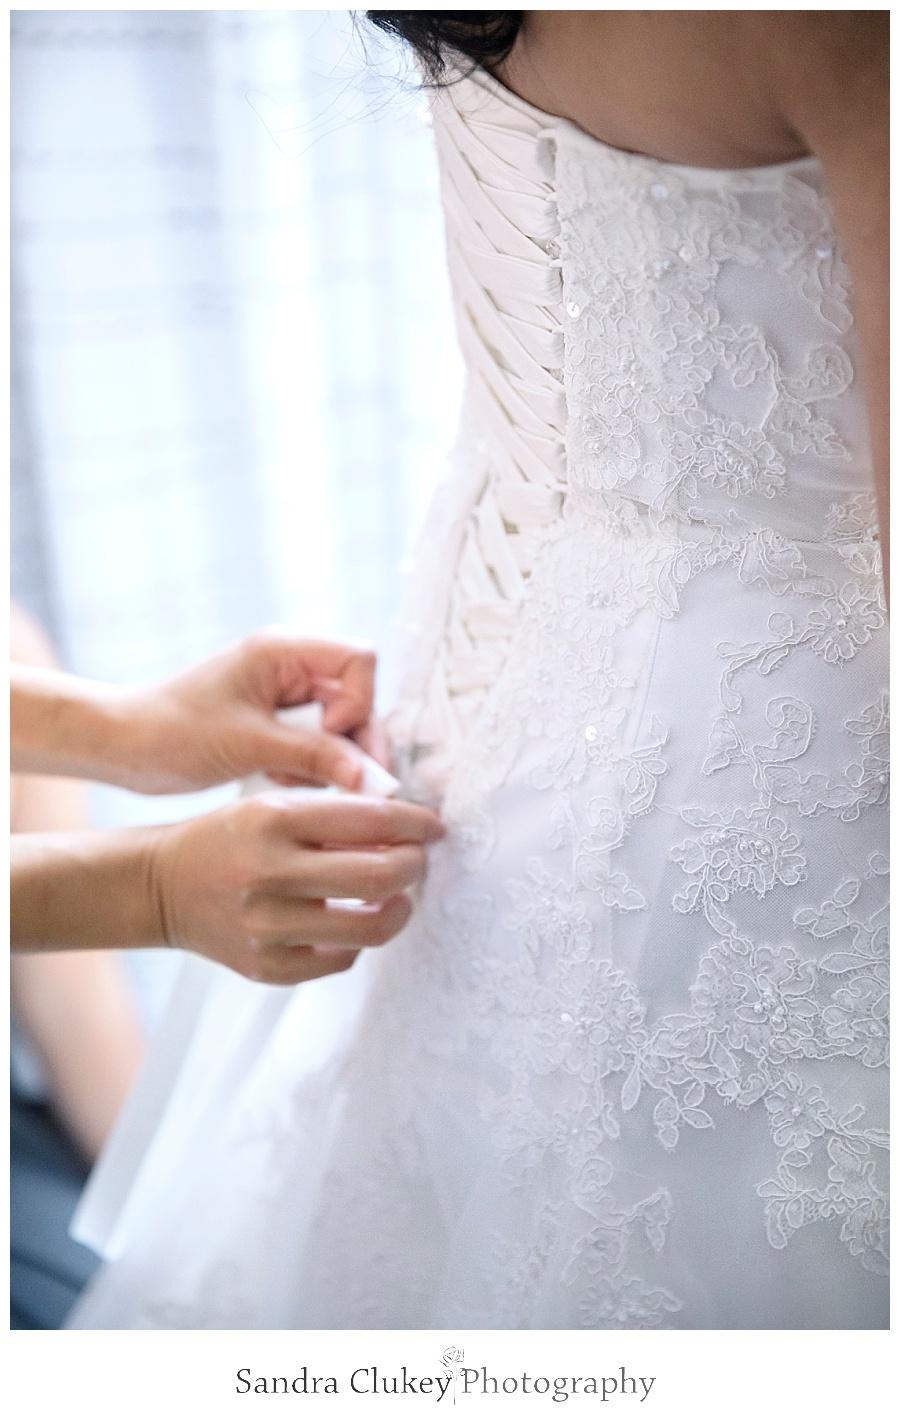 Tying brides dress